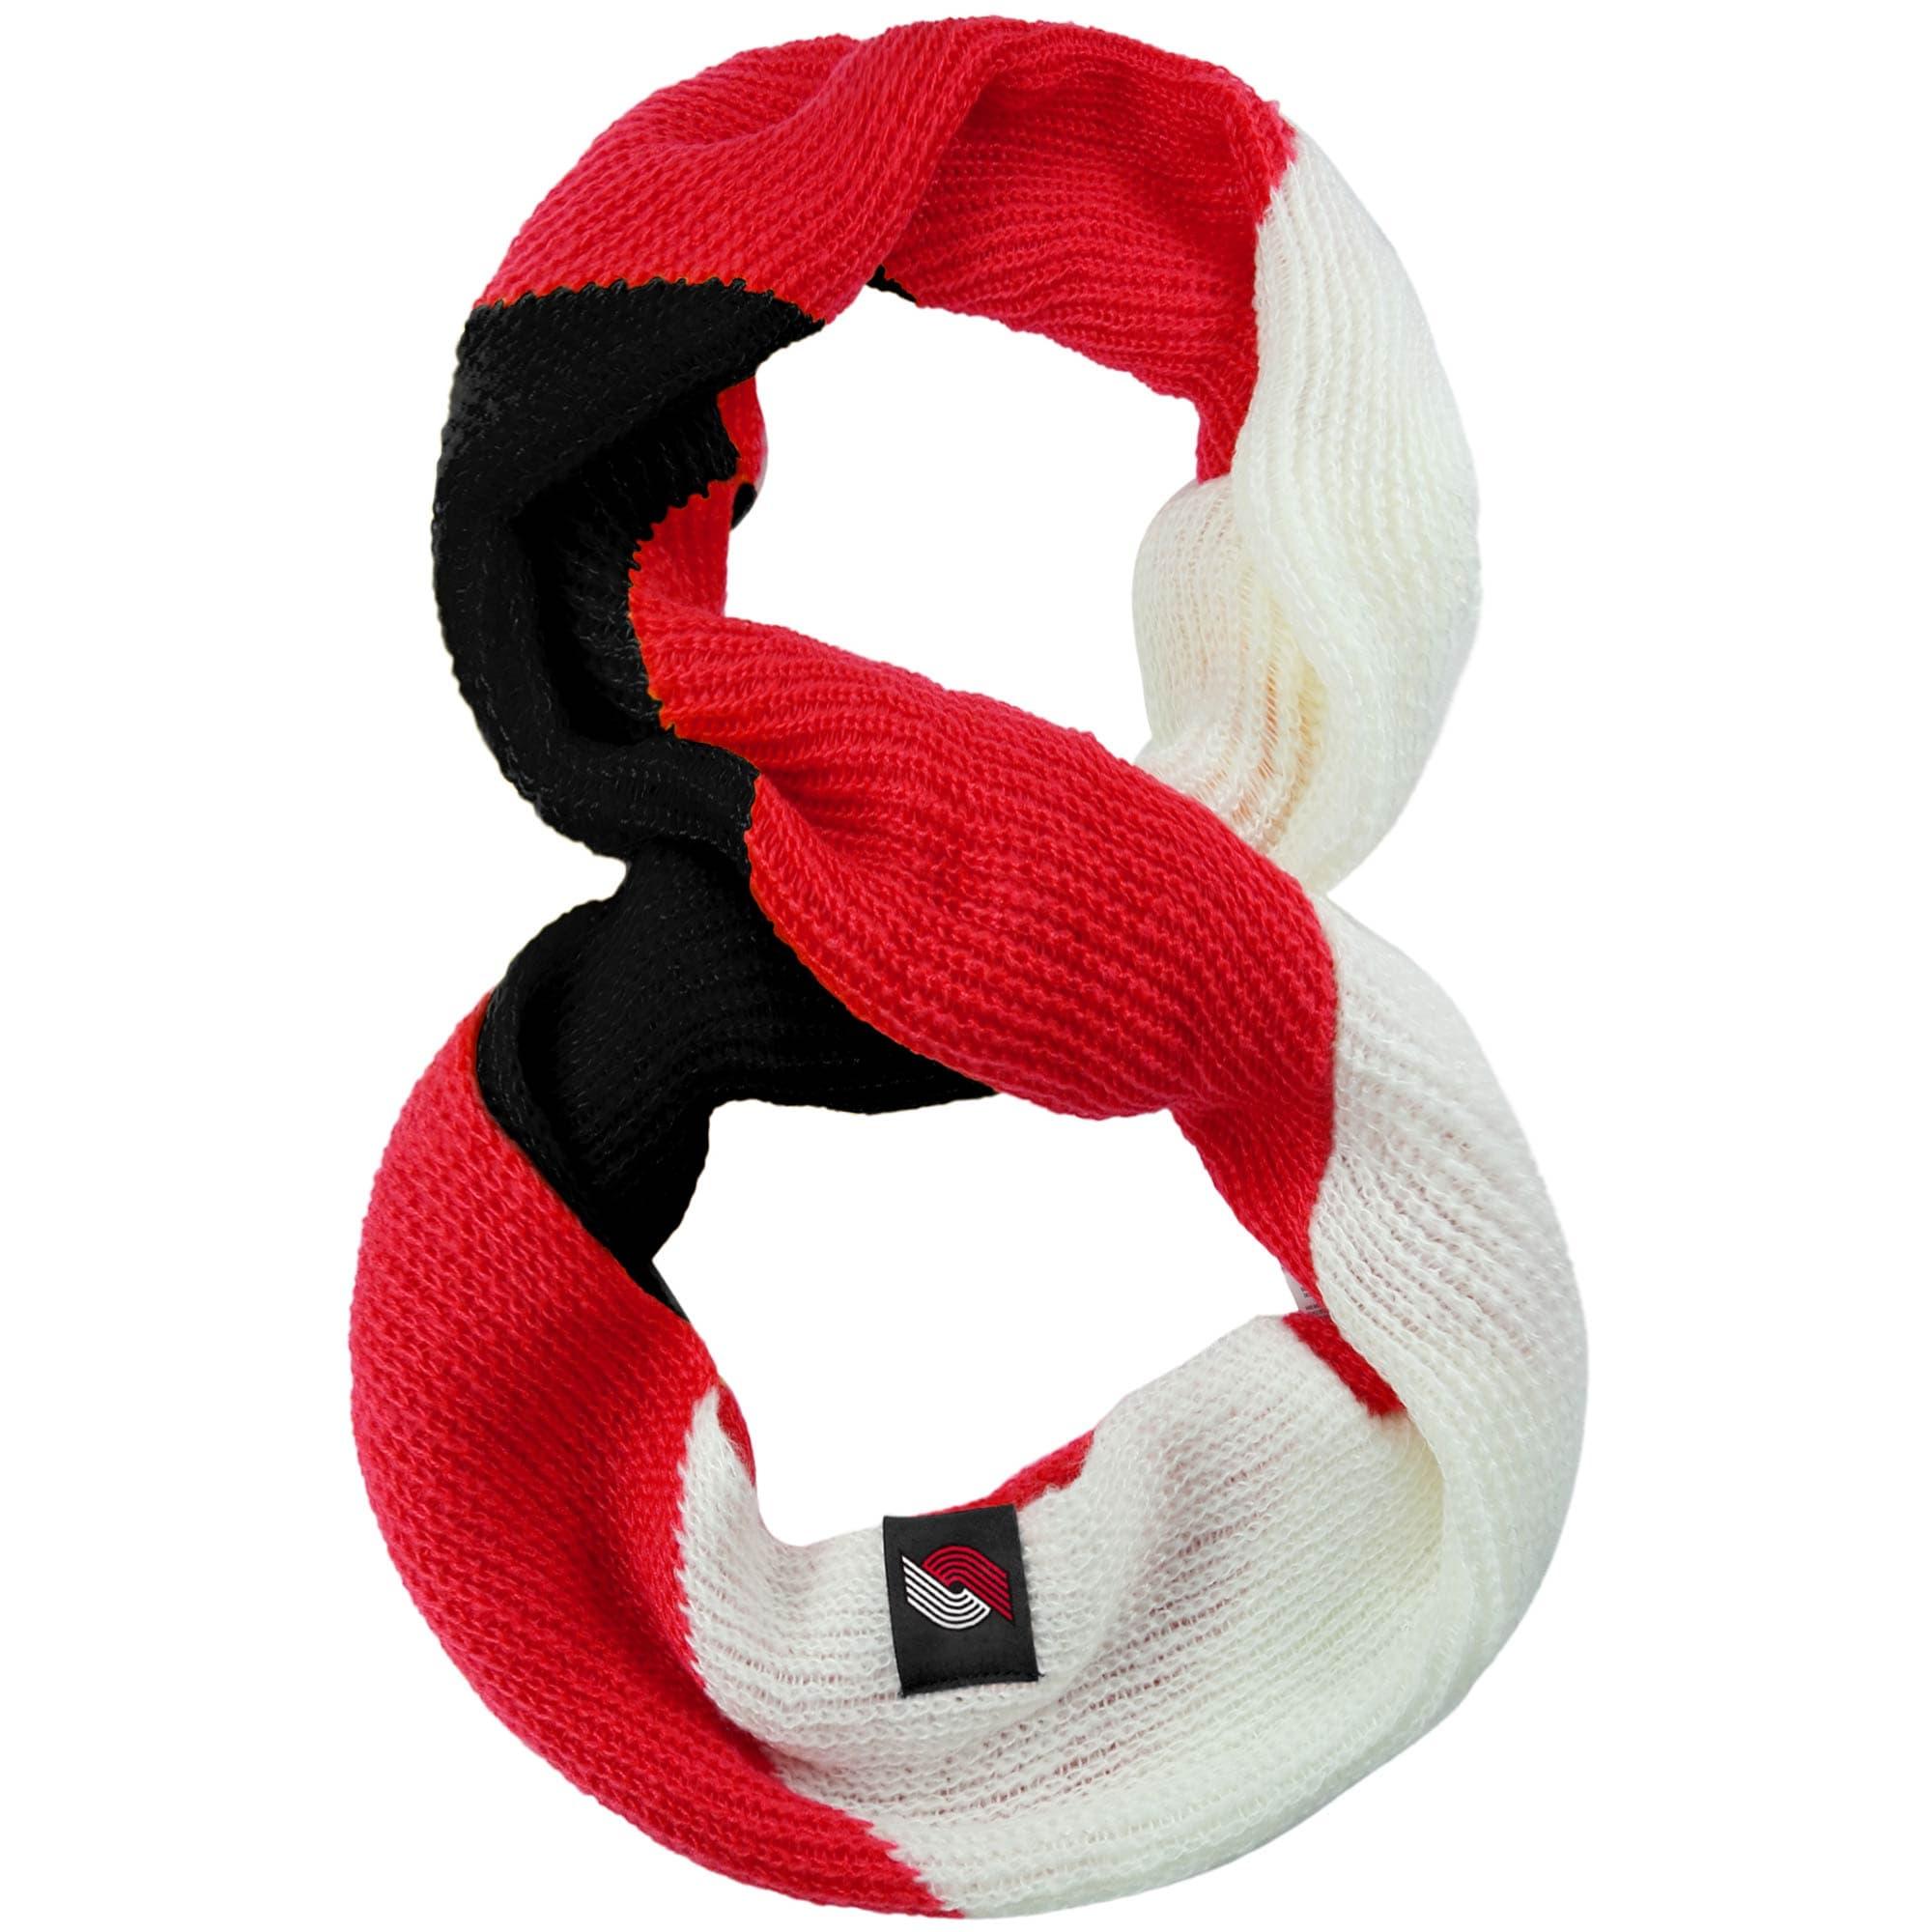 Portland Trail Blazers Women's Color Block Knit Infinity Scarf